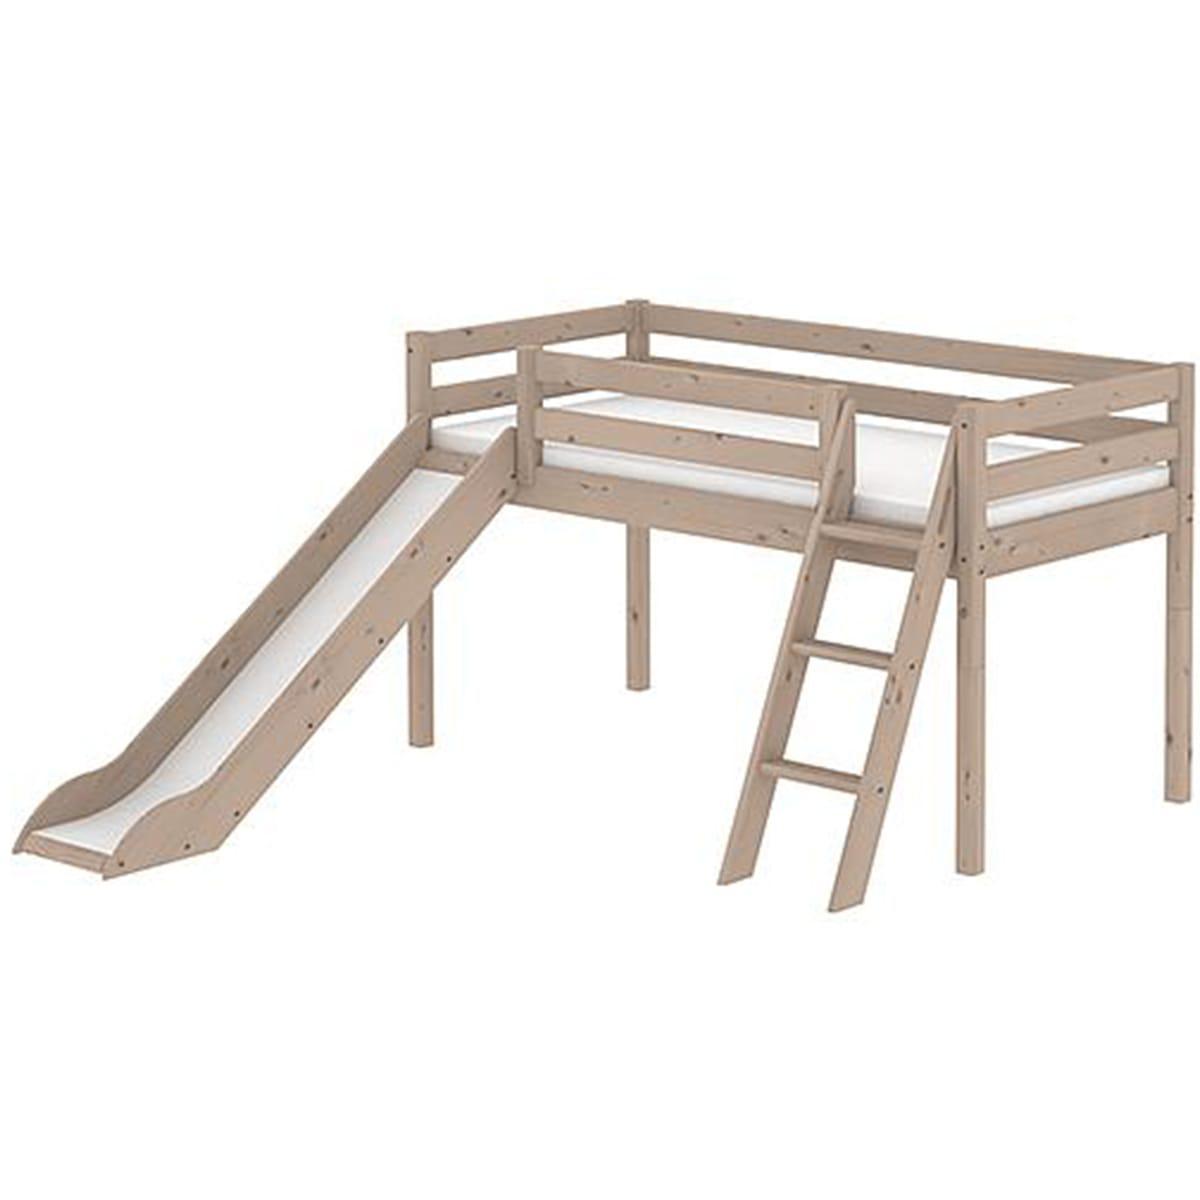 Cama media alta 90x200 CLASSIC Flexa escalera inclinada tobogán terra